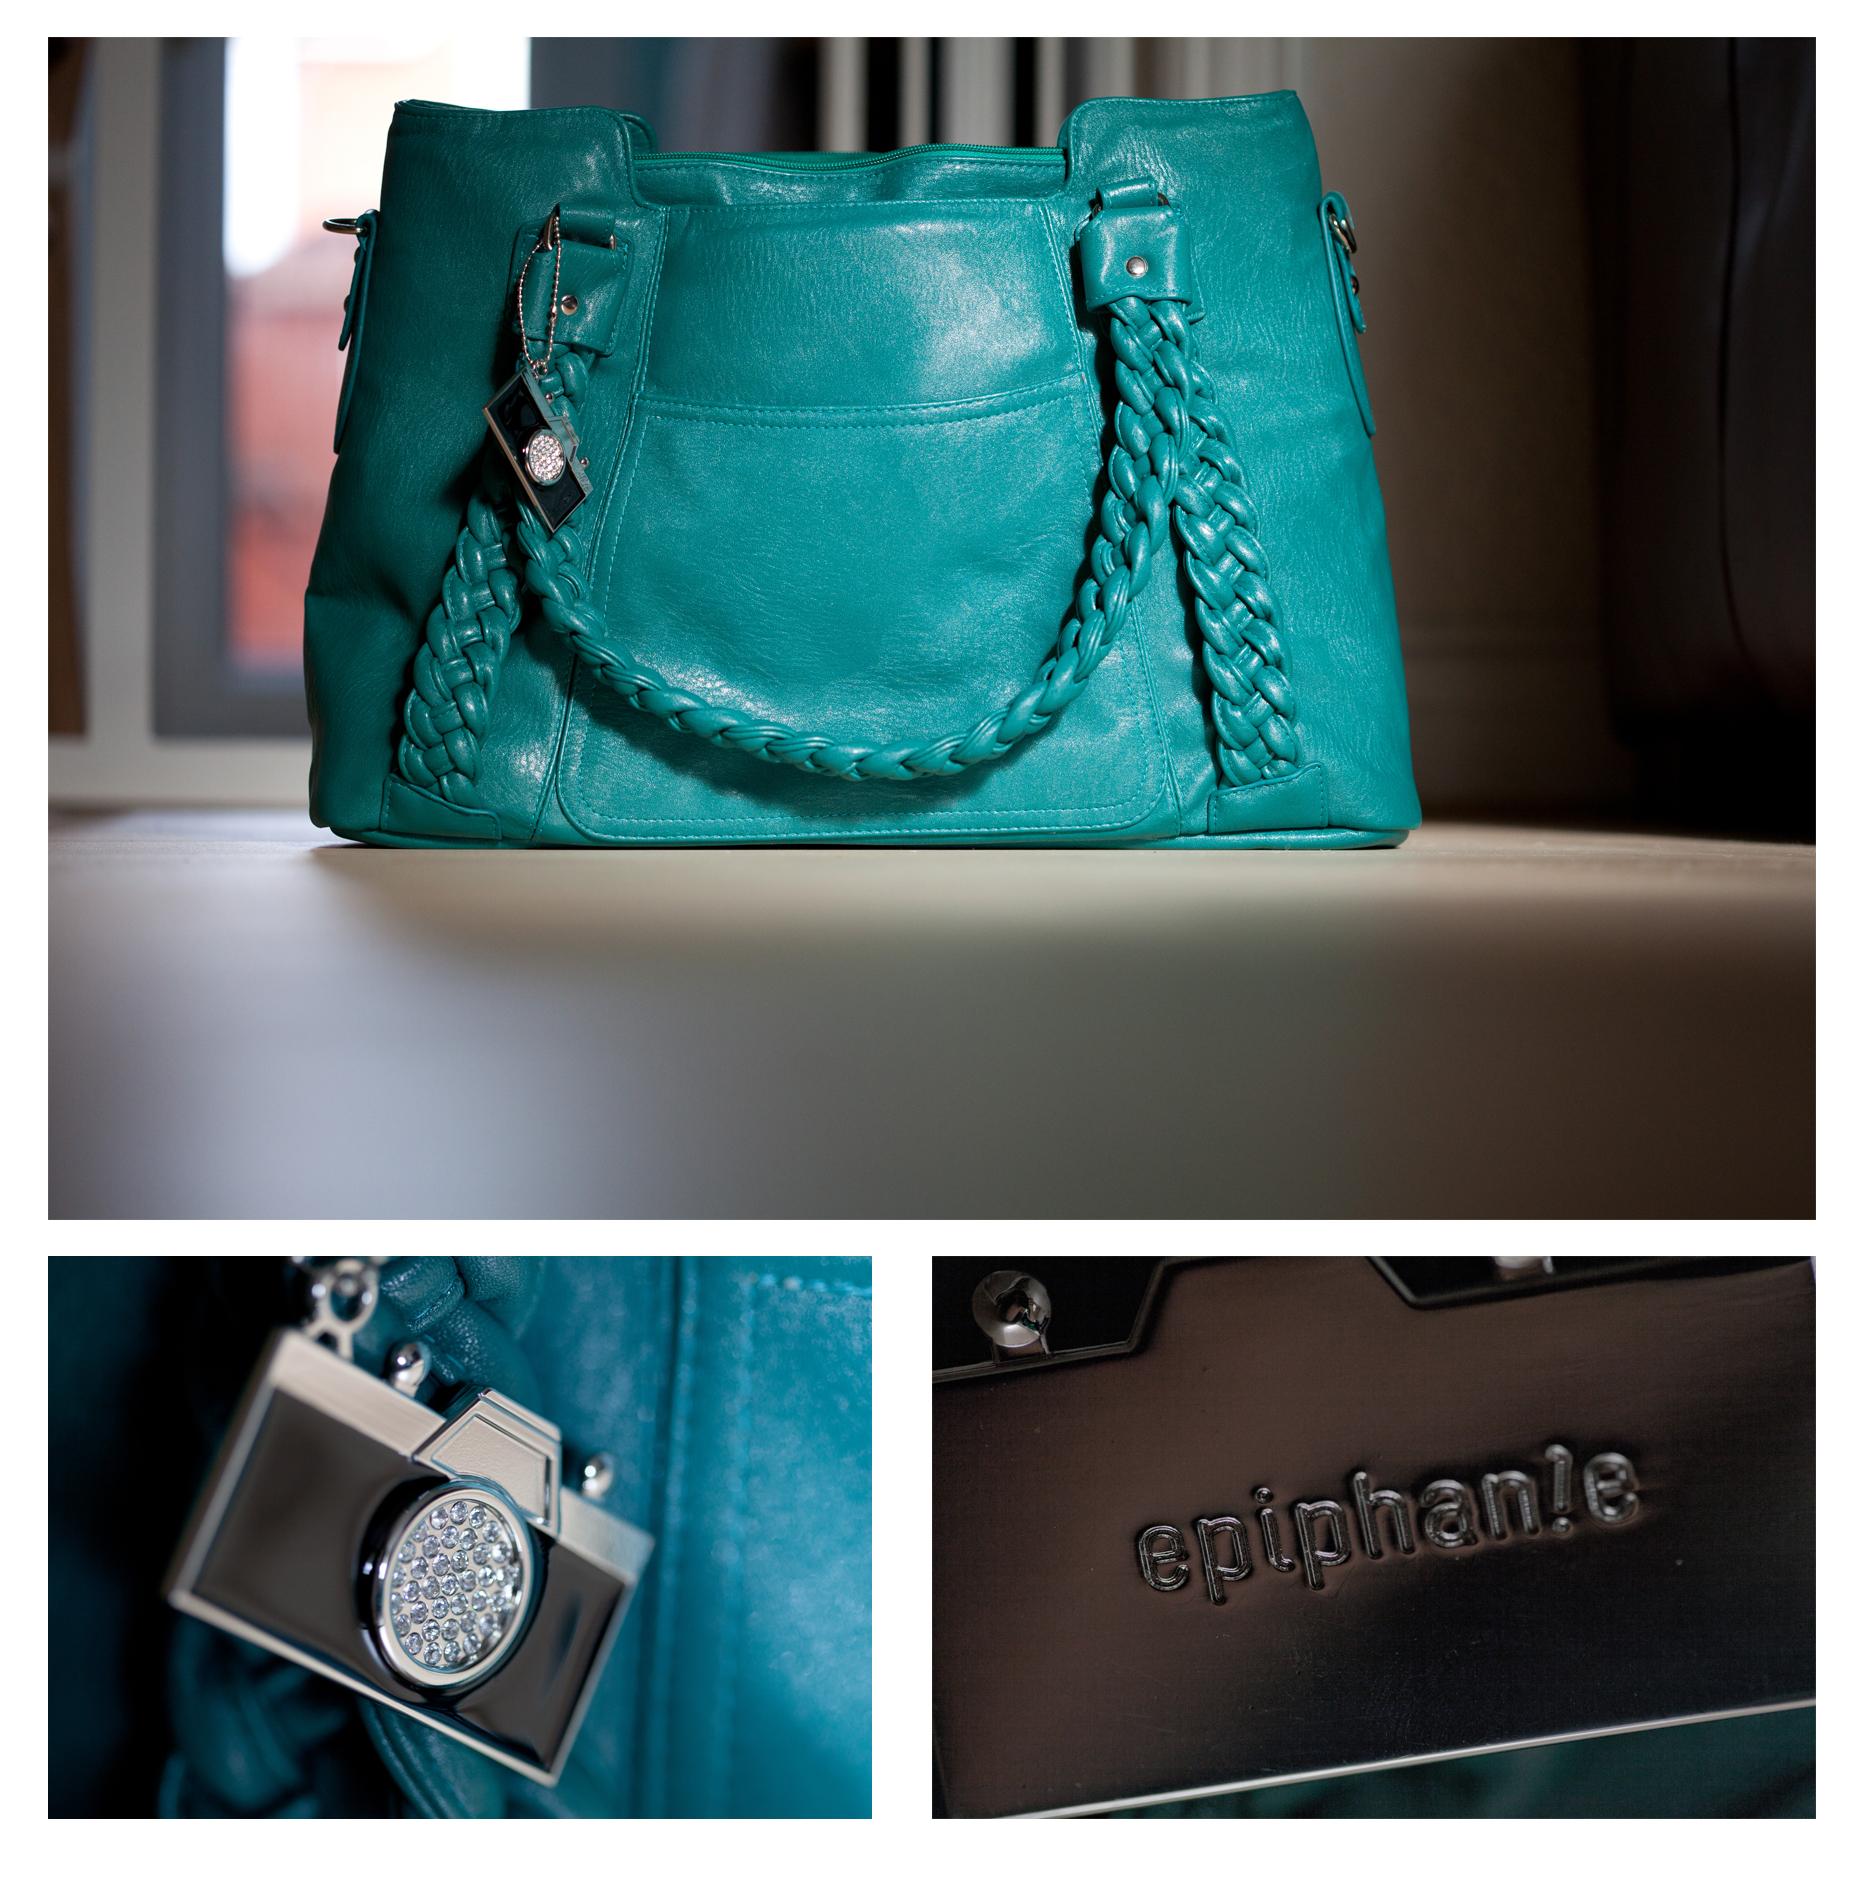 Epiphanie bag wedding photographer gear reviewkarli for Wedding photographer camera bag